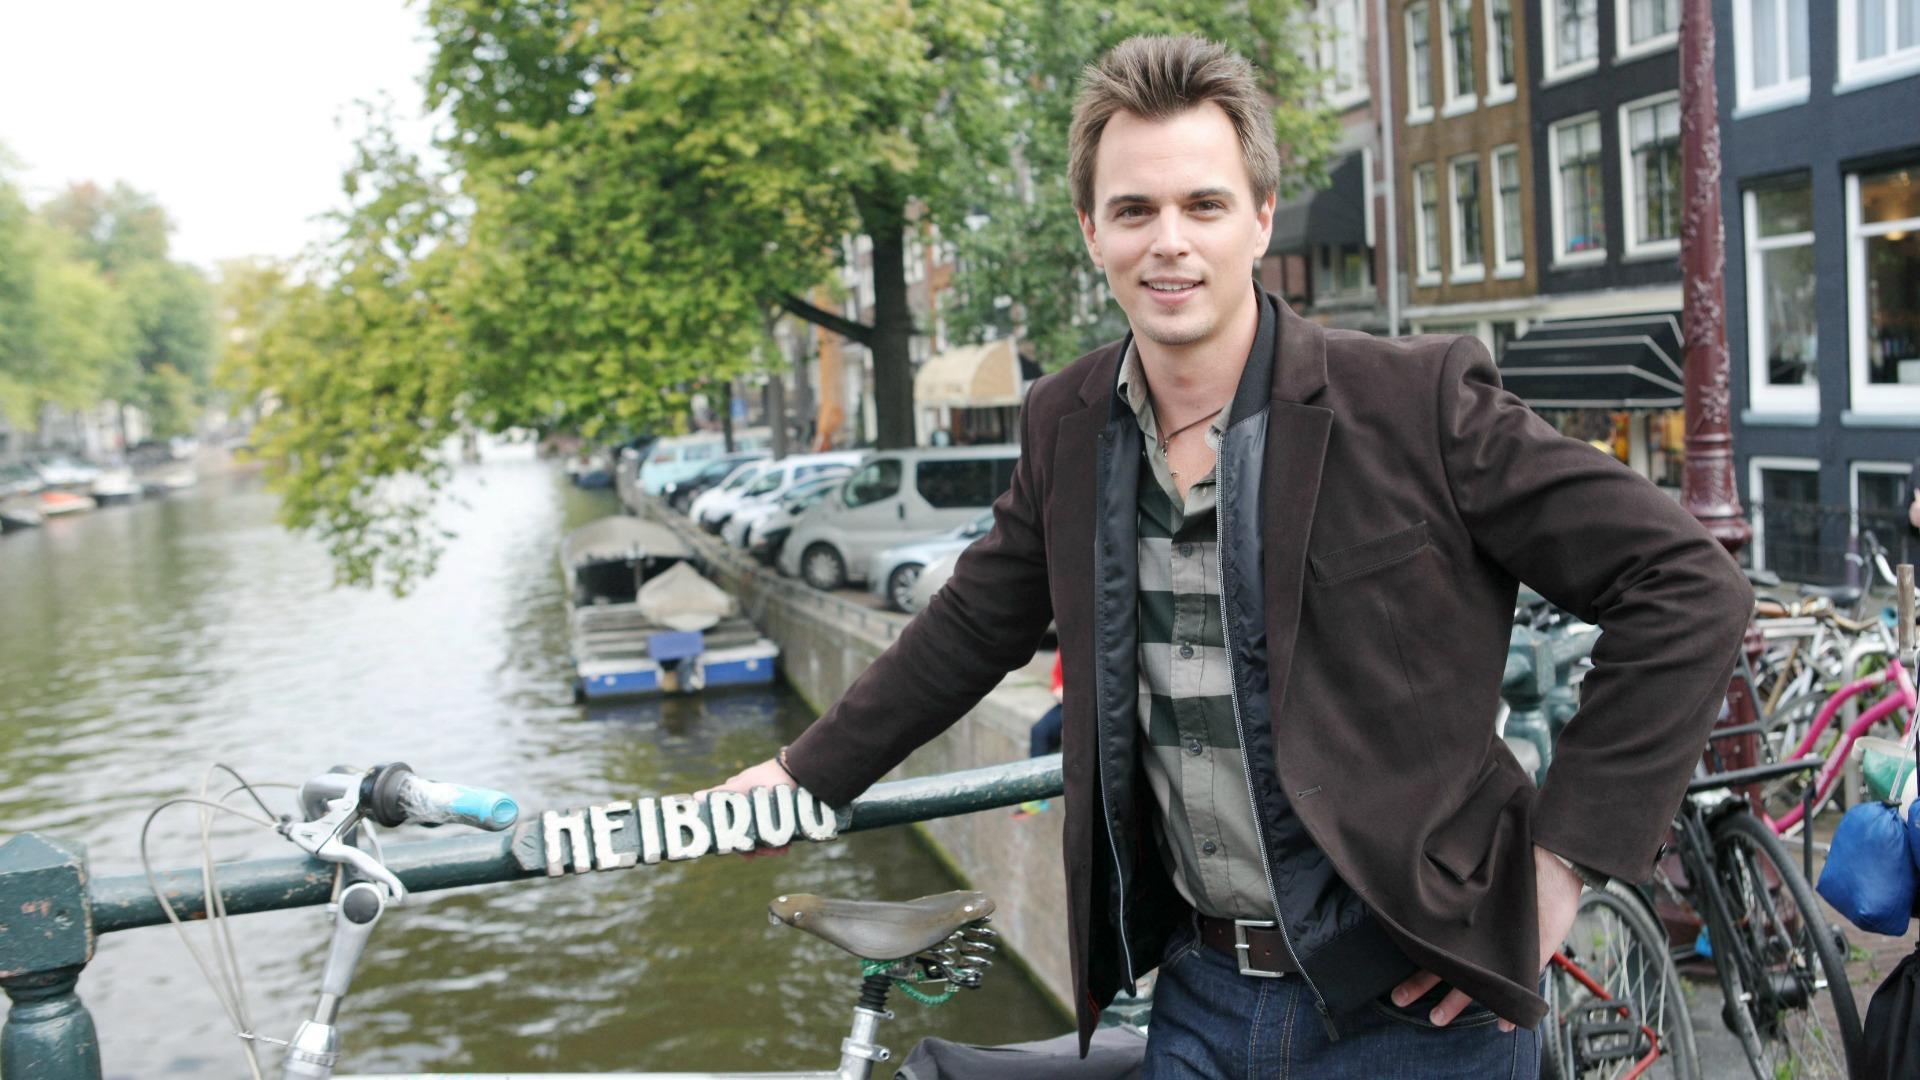 Darin Brooks took a stroll through the fun-loving city of Amsterdam.